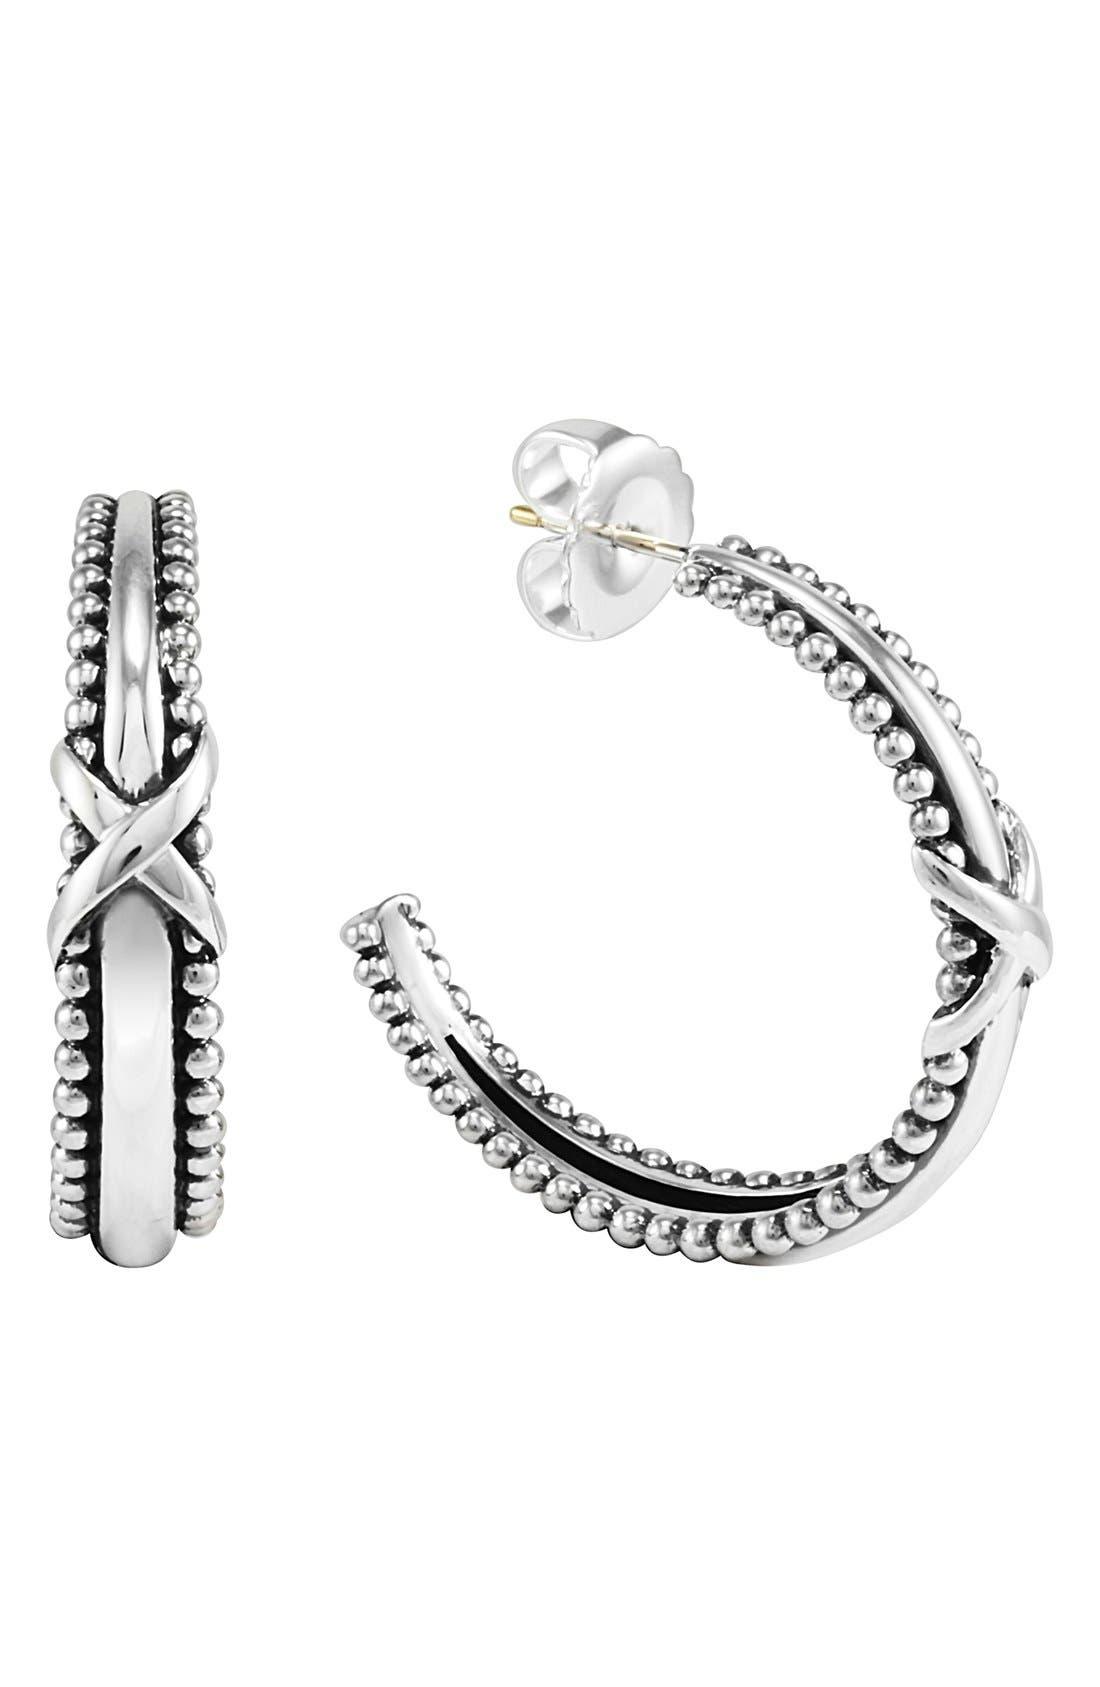 Main Image - LAGOS 'X' Caviar Tapered Hoop Earrings